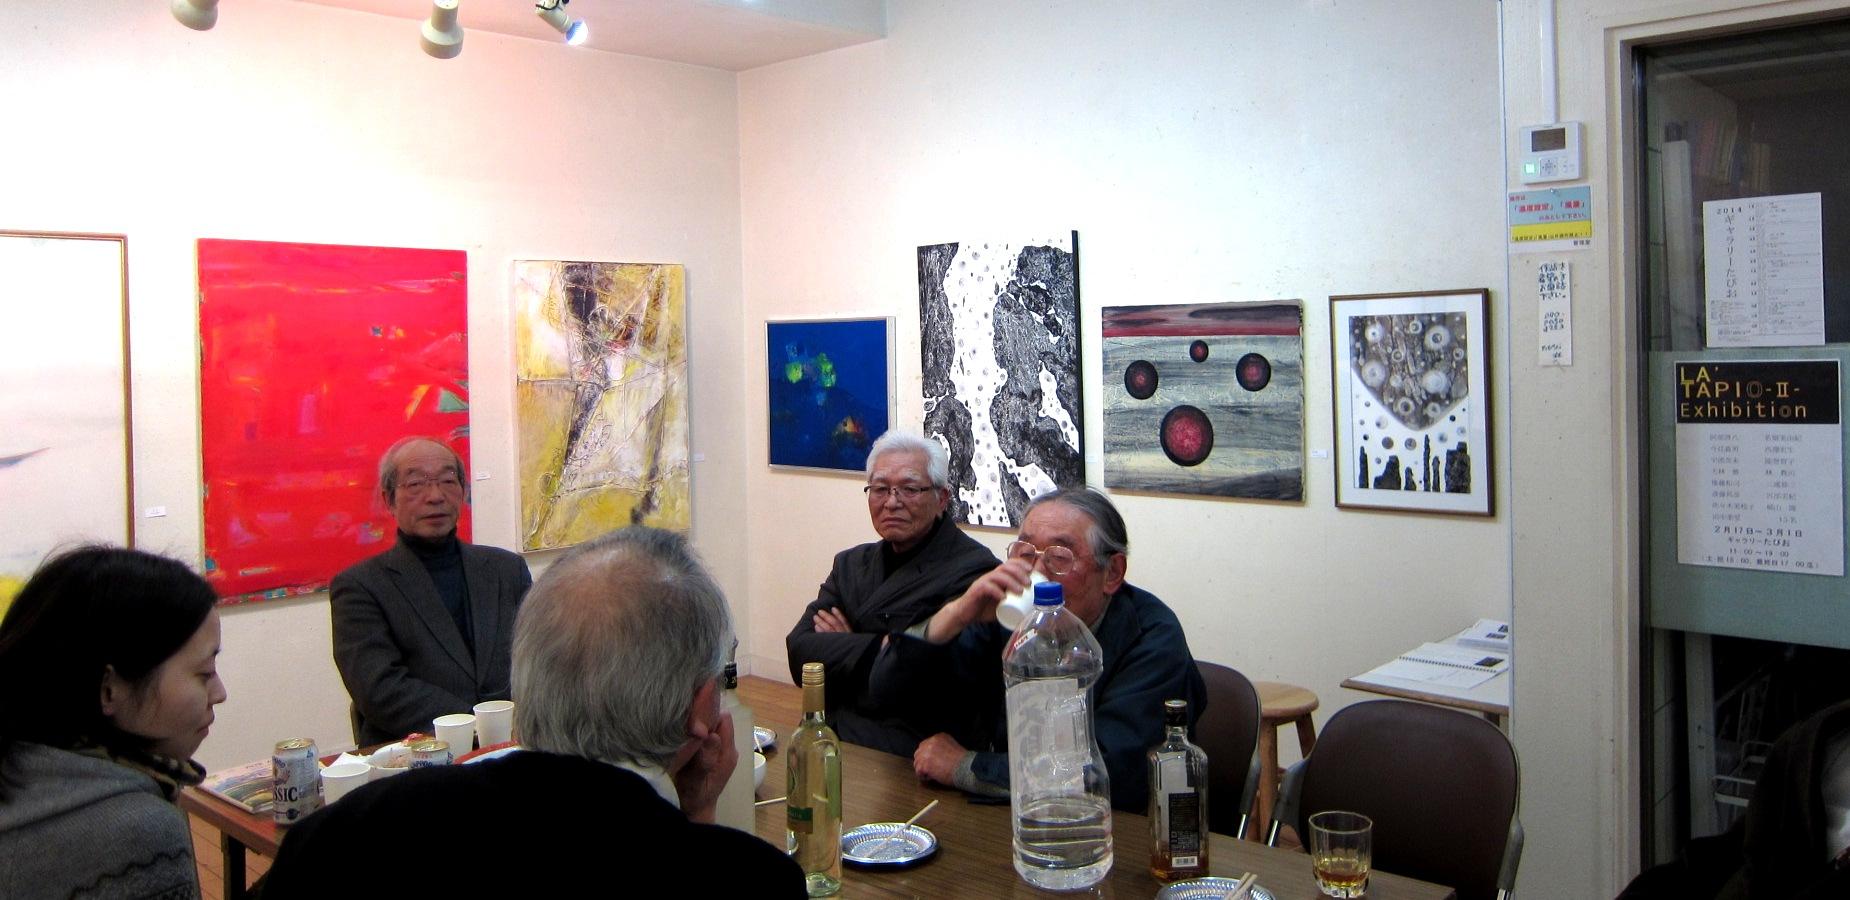 2354) 「LA`TAPIO -Ⅱ- Exhibition」 たぴお 1月27日(月)~2月15日(土)_f0126829_9204293.jpg